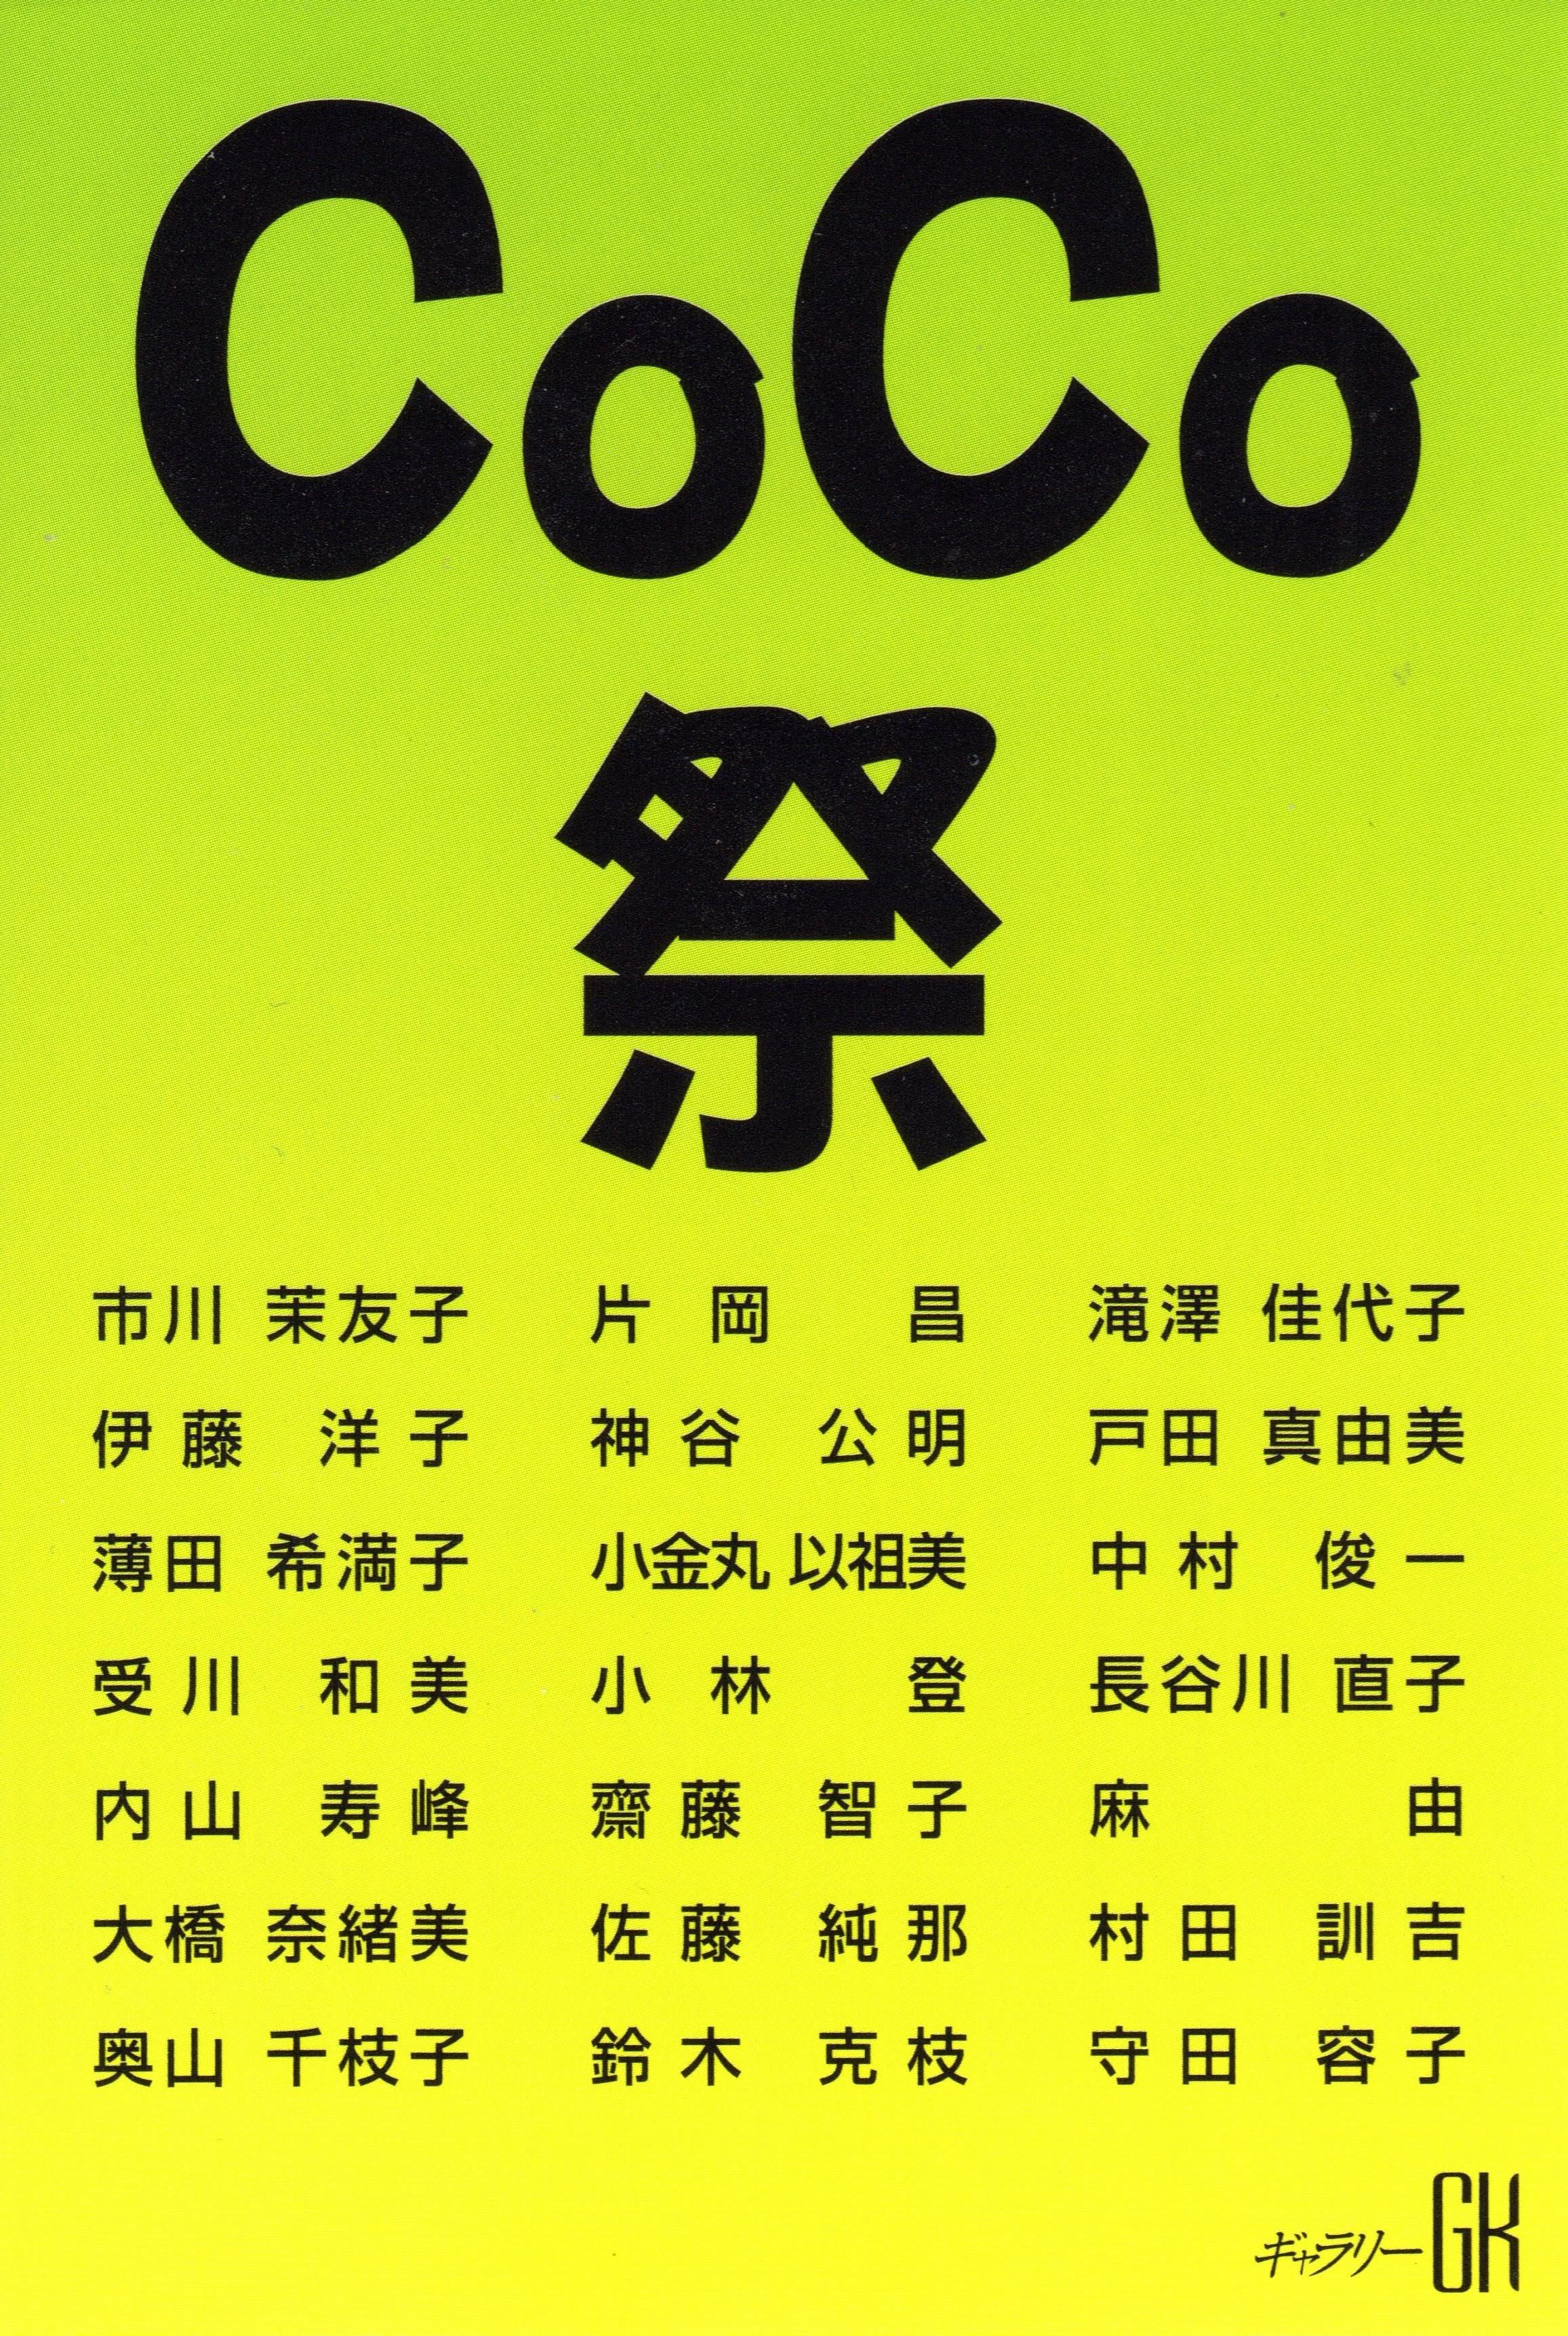 「CoCo祭」。(伊藤 洋子 も 出品)